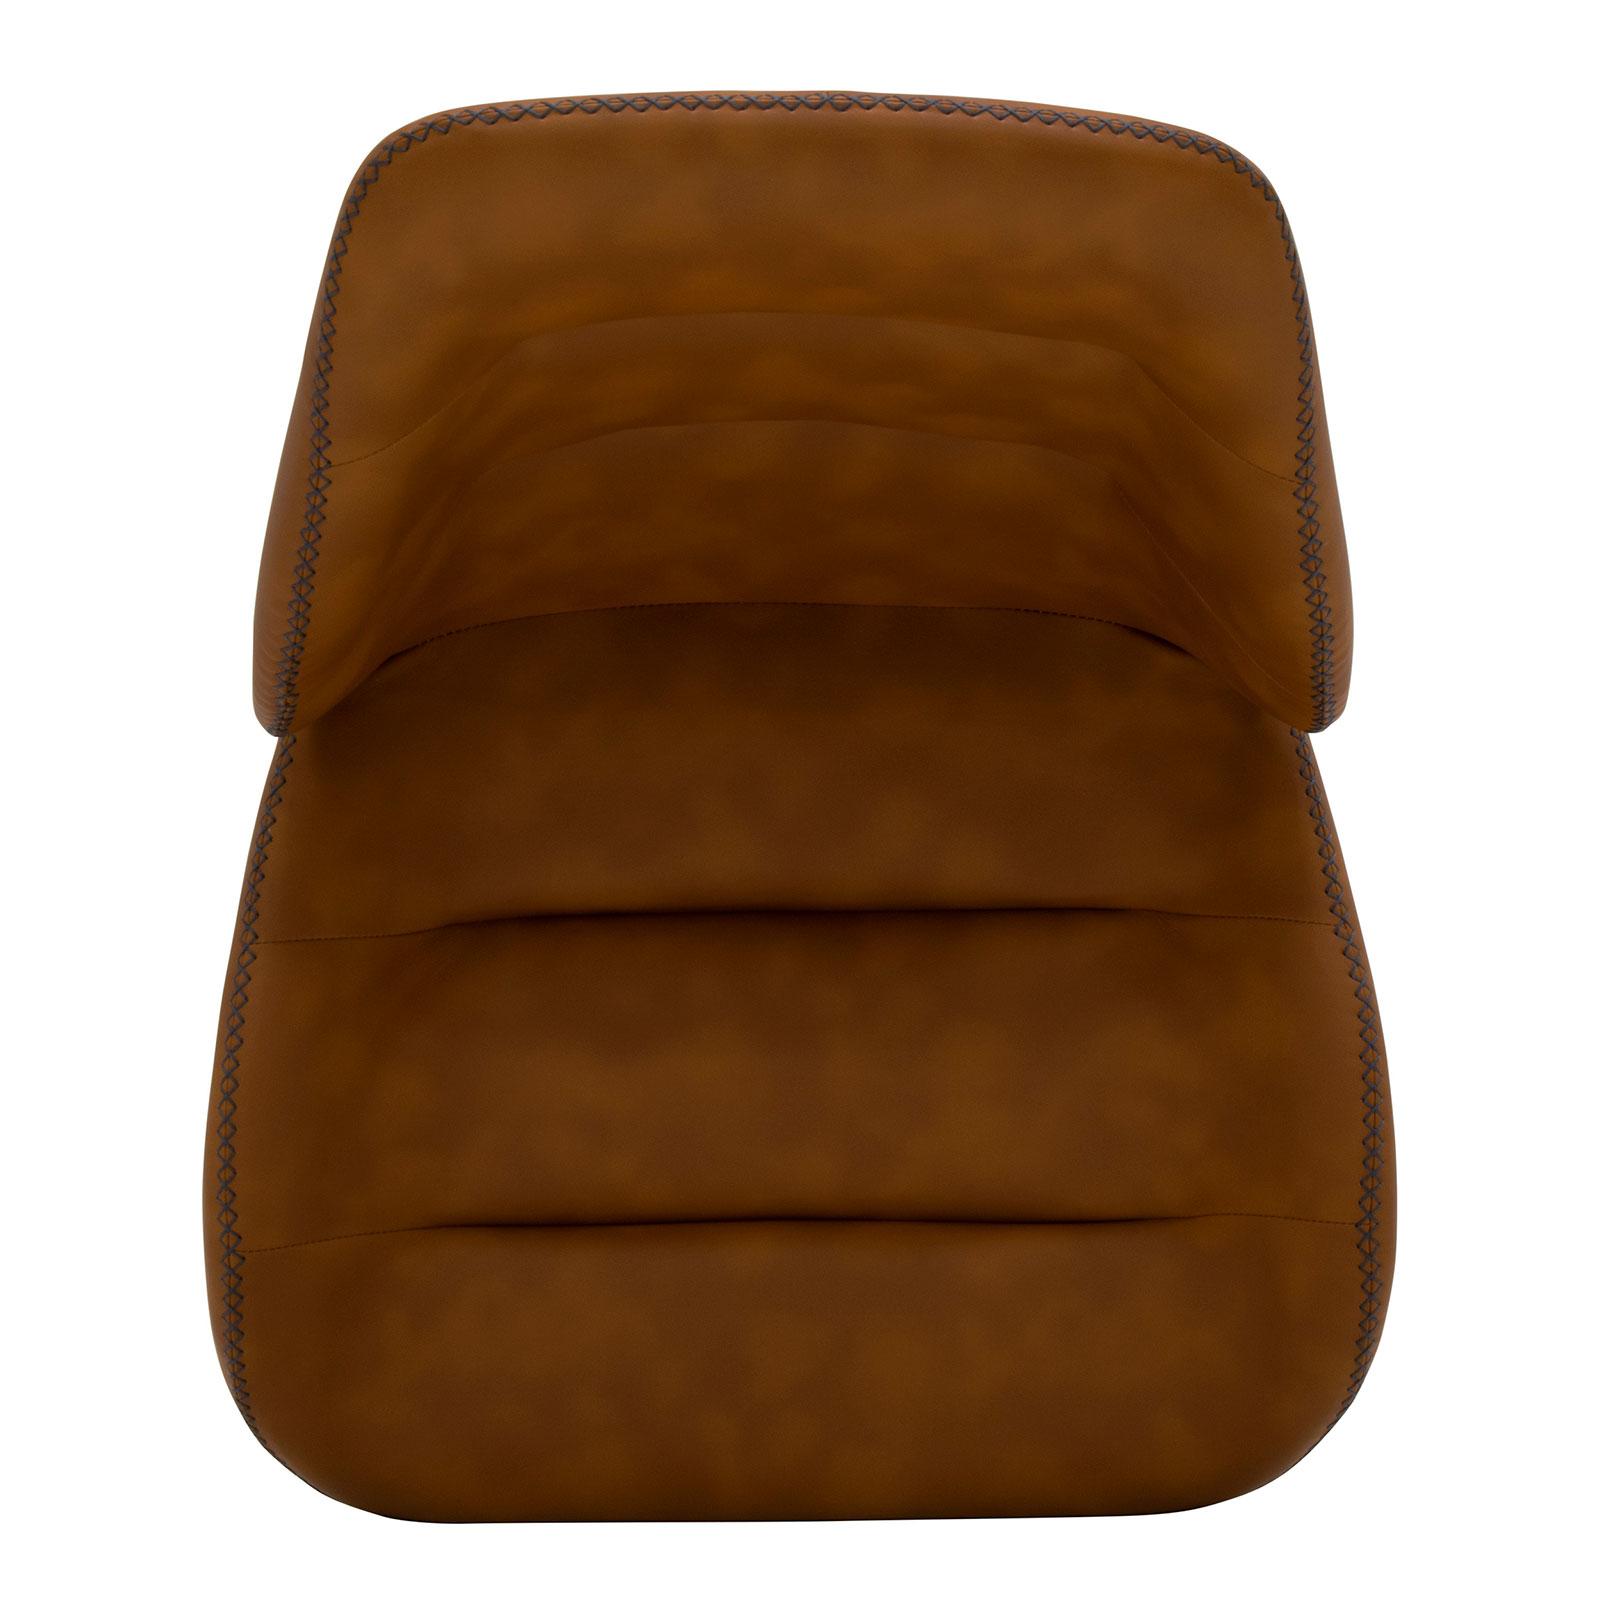 52001-Devonport-Office-Chair-top